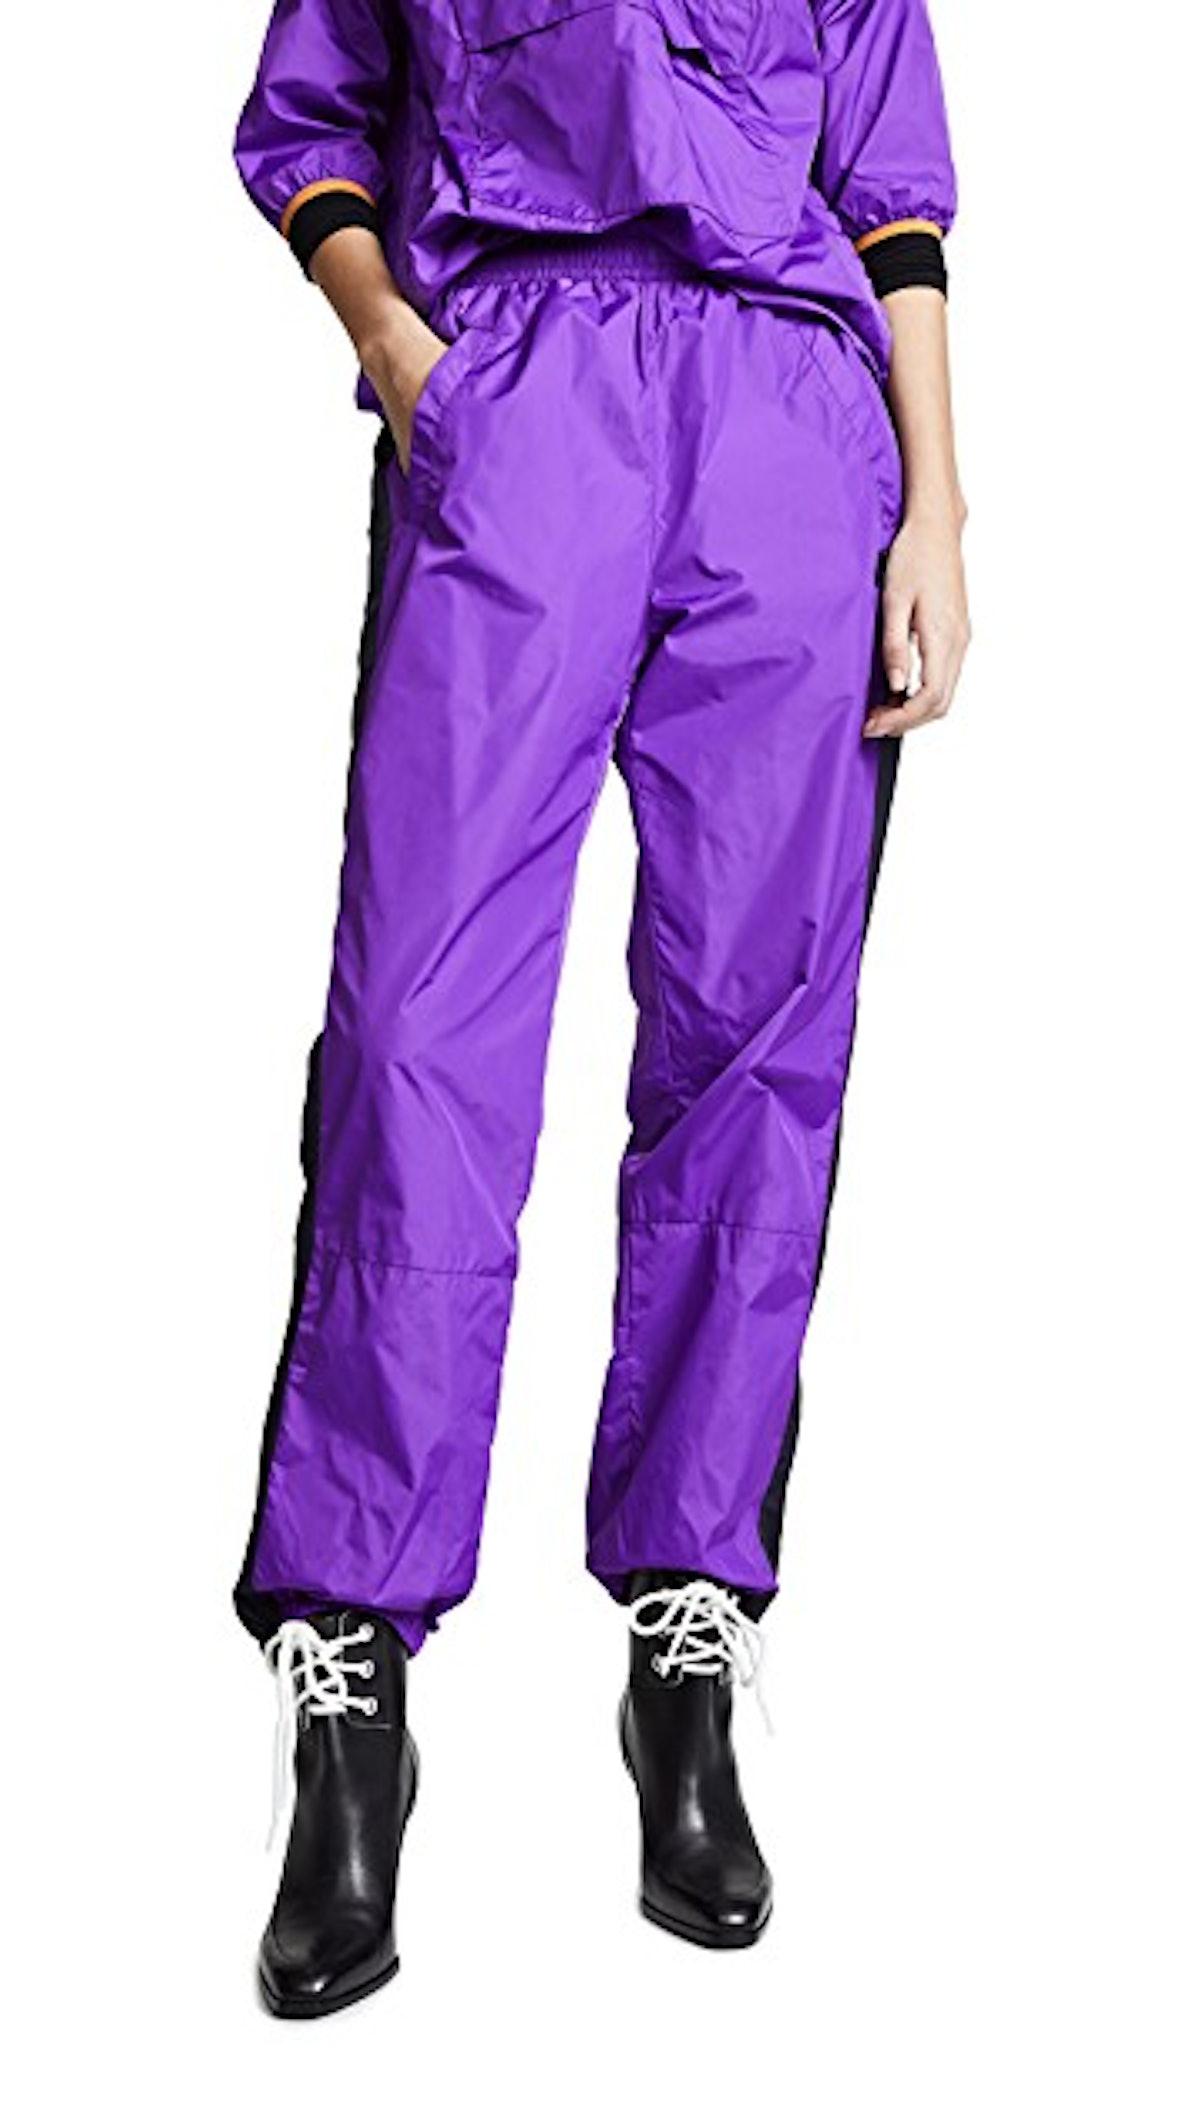 Nylon Pants in Violet Purple